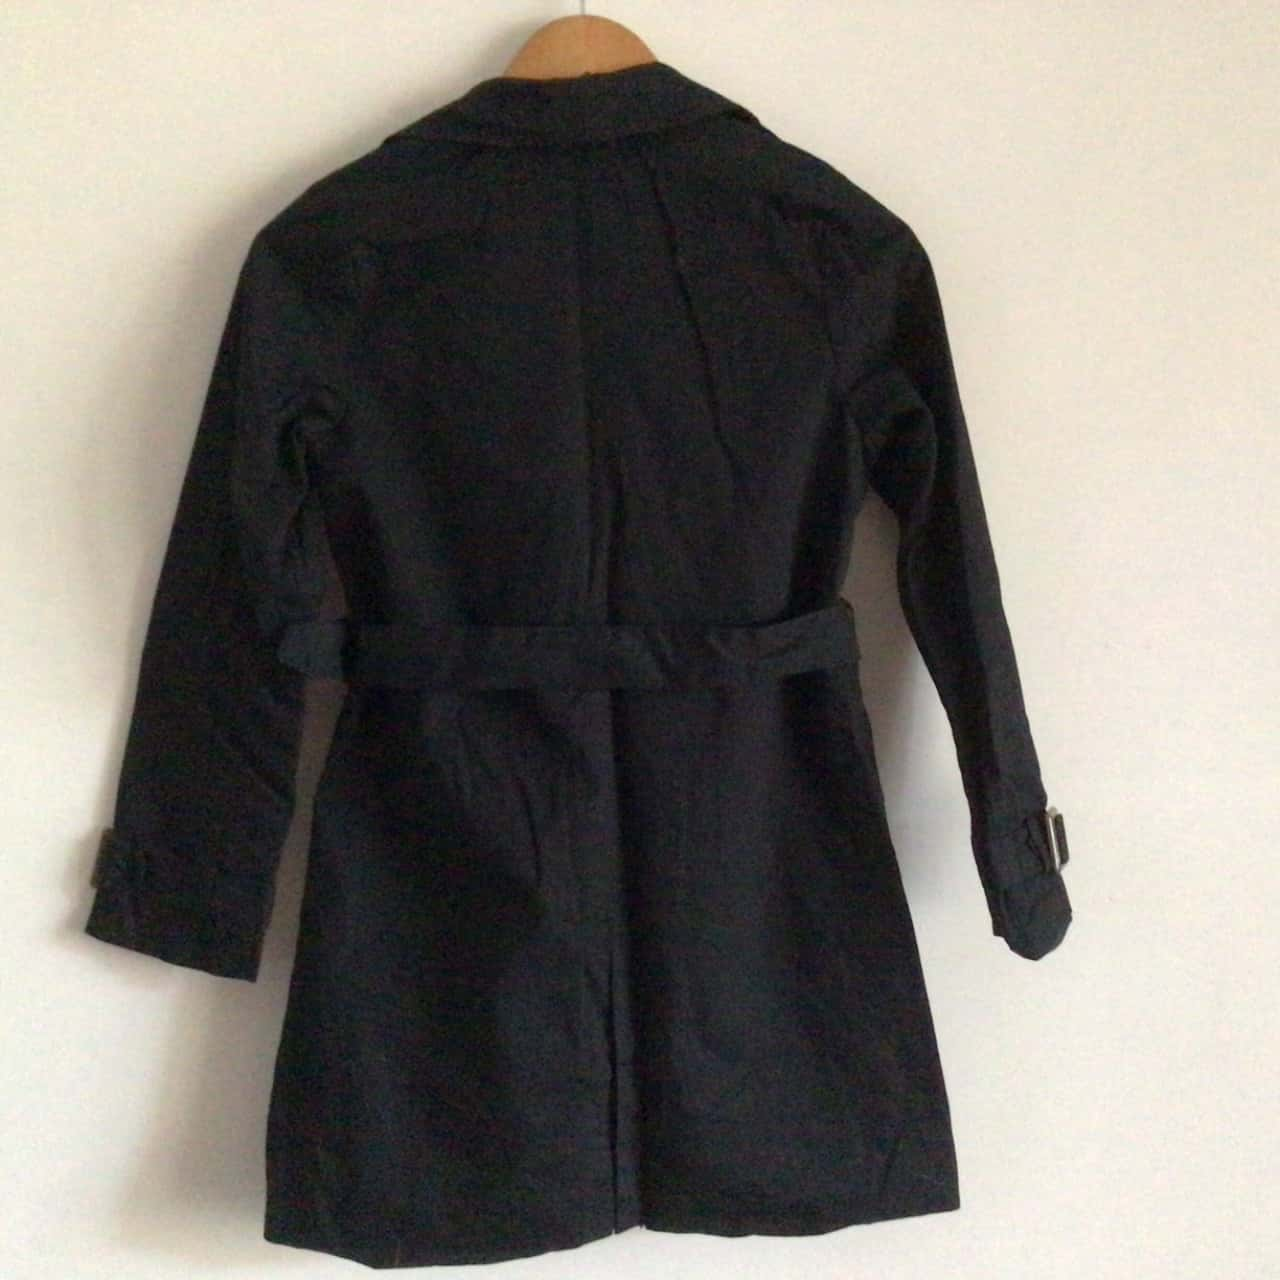 Girls ZARA &FRIENDS TRENCH COAT  Size 9/10  Black